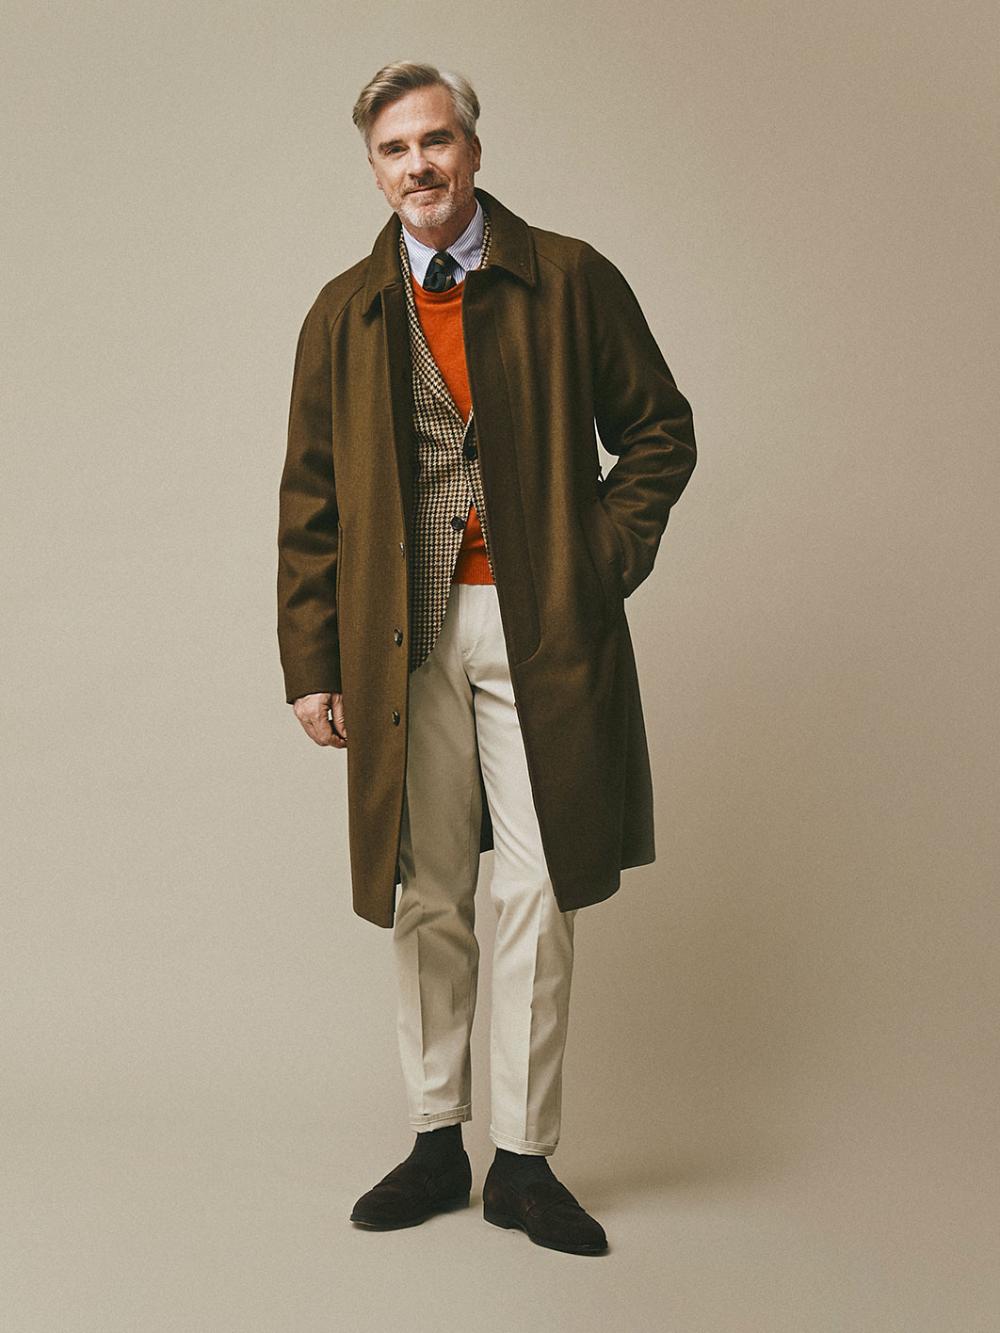 BEAMS MEN'S DRESS 201920 Autumn / Winter Style 冬のスタイル